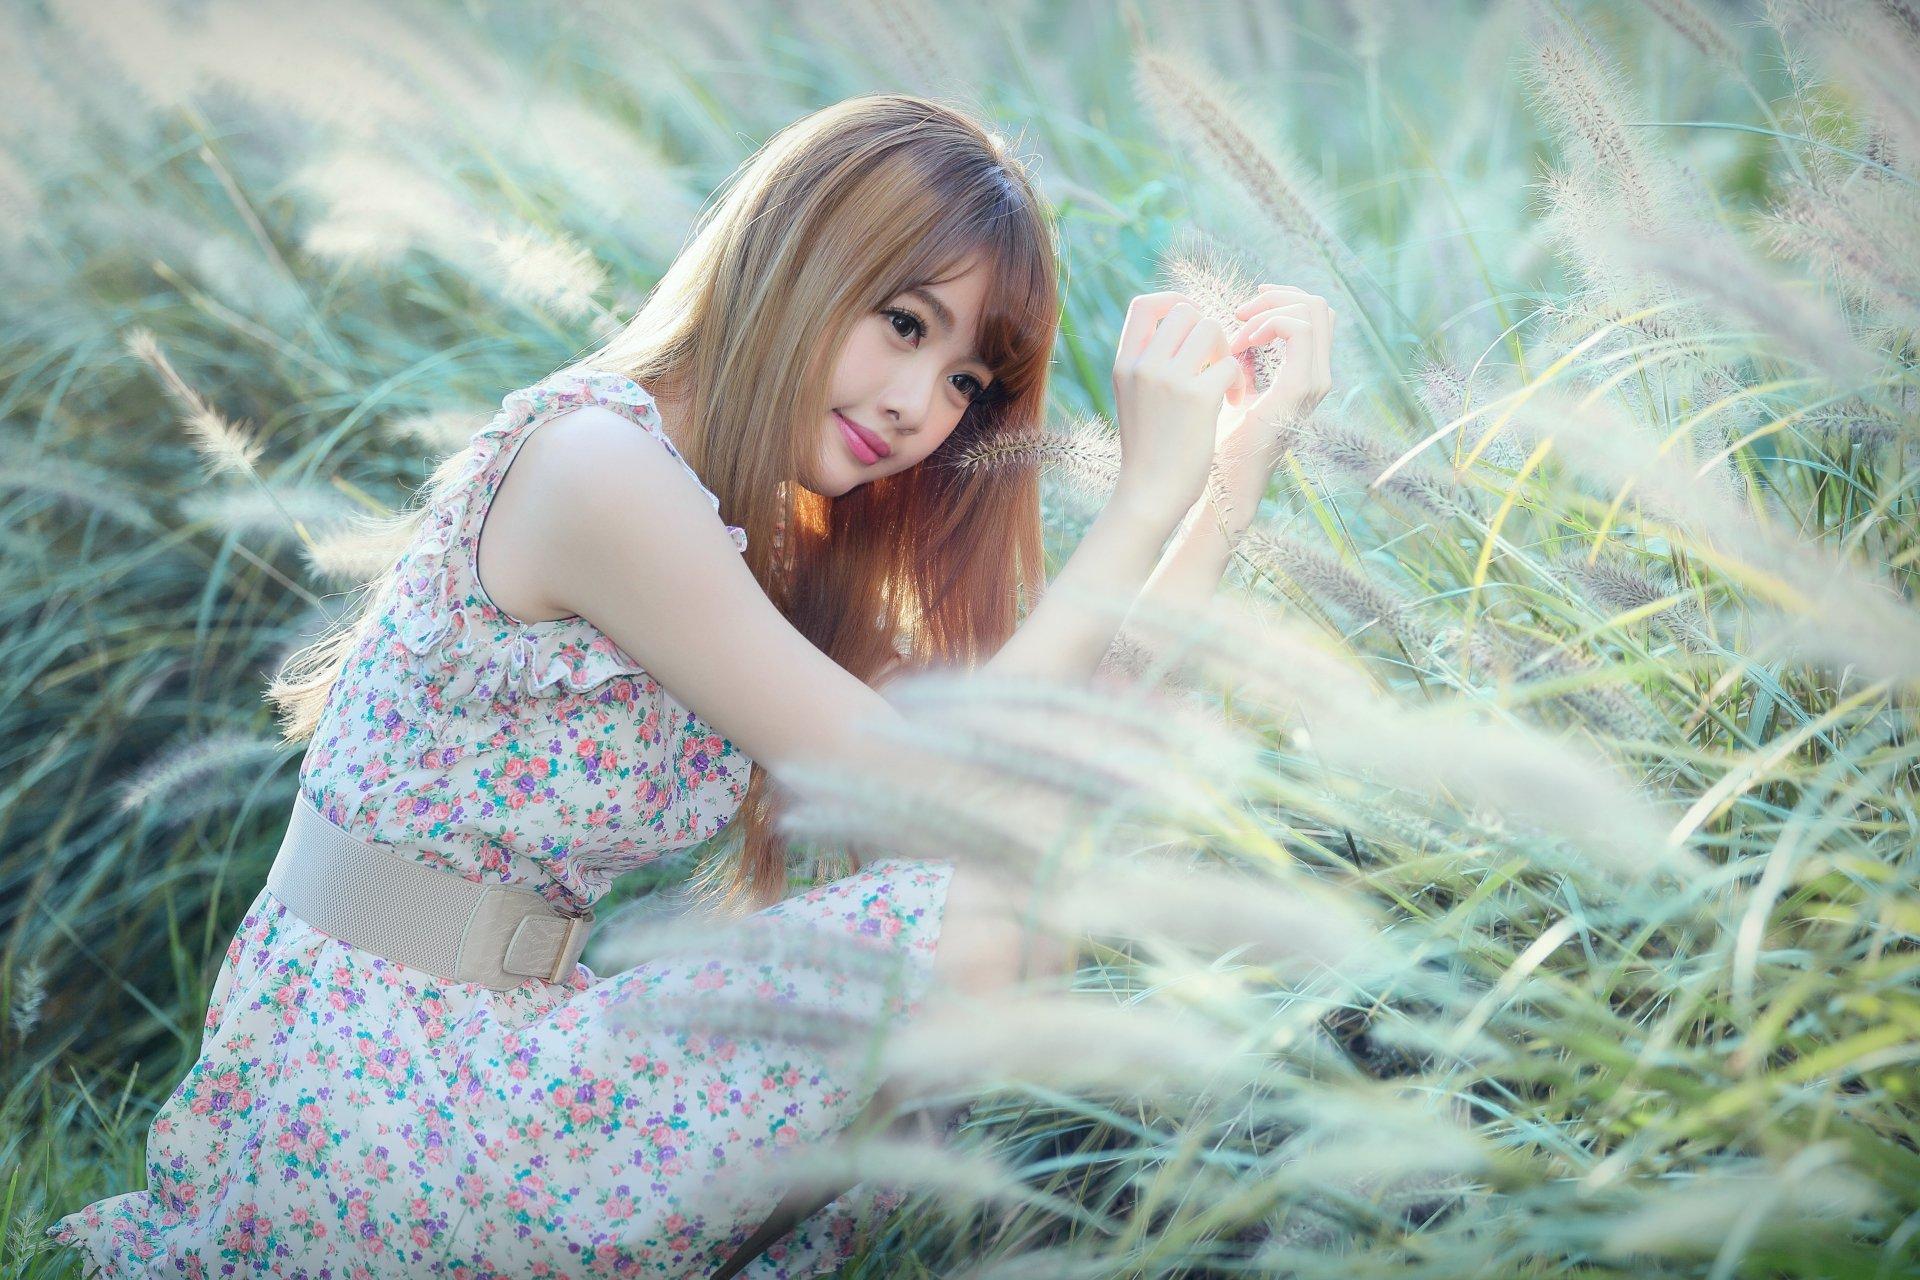 Women - Cubie Wang  Smile Belt Dress Portrait Bokeh Taiwanese Asian Model Girl Wallpaper